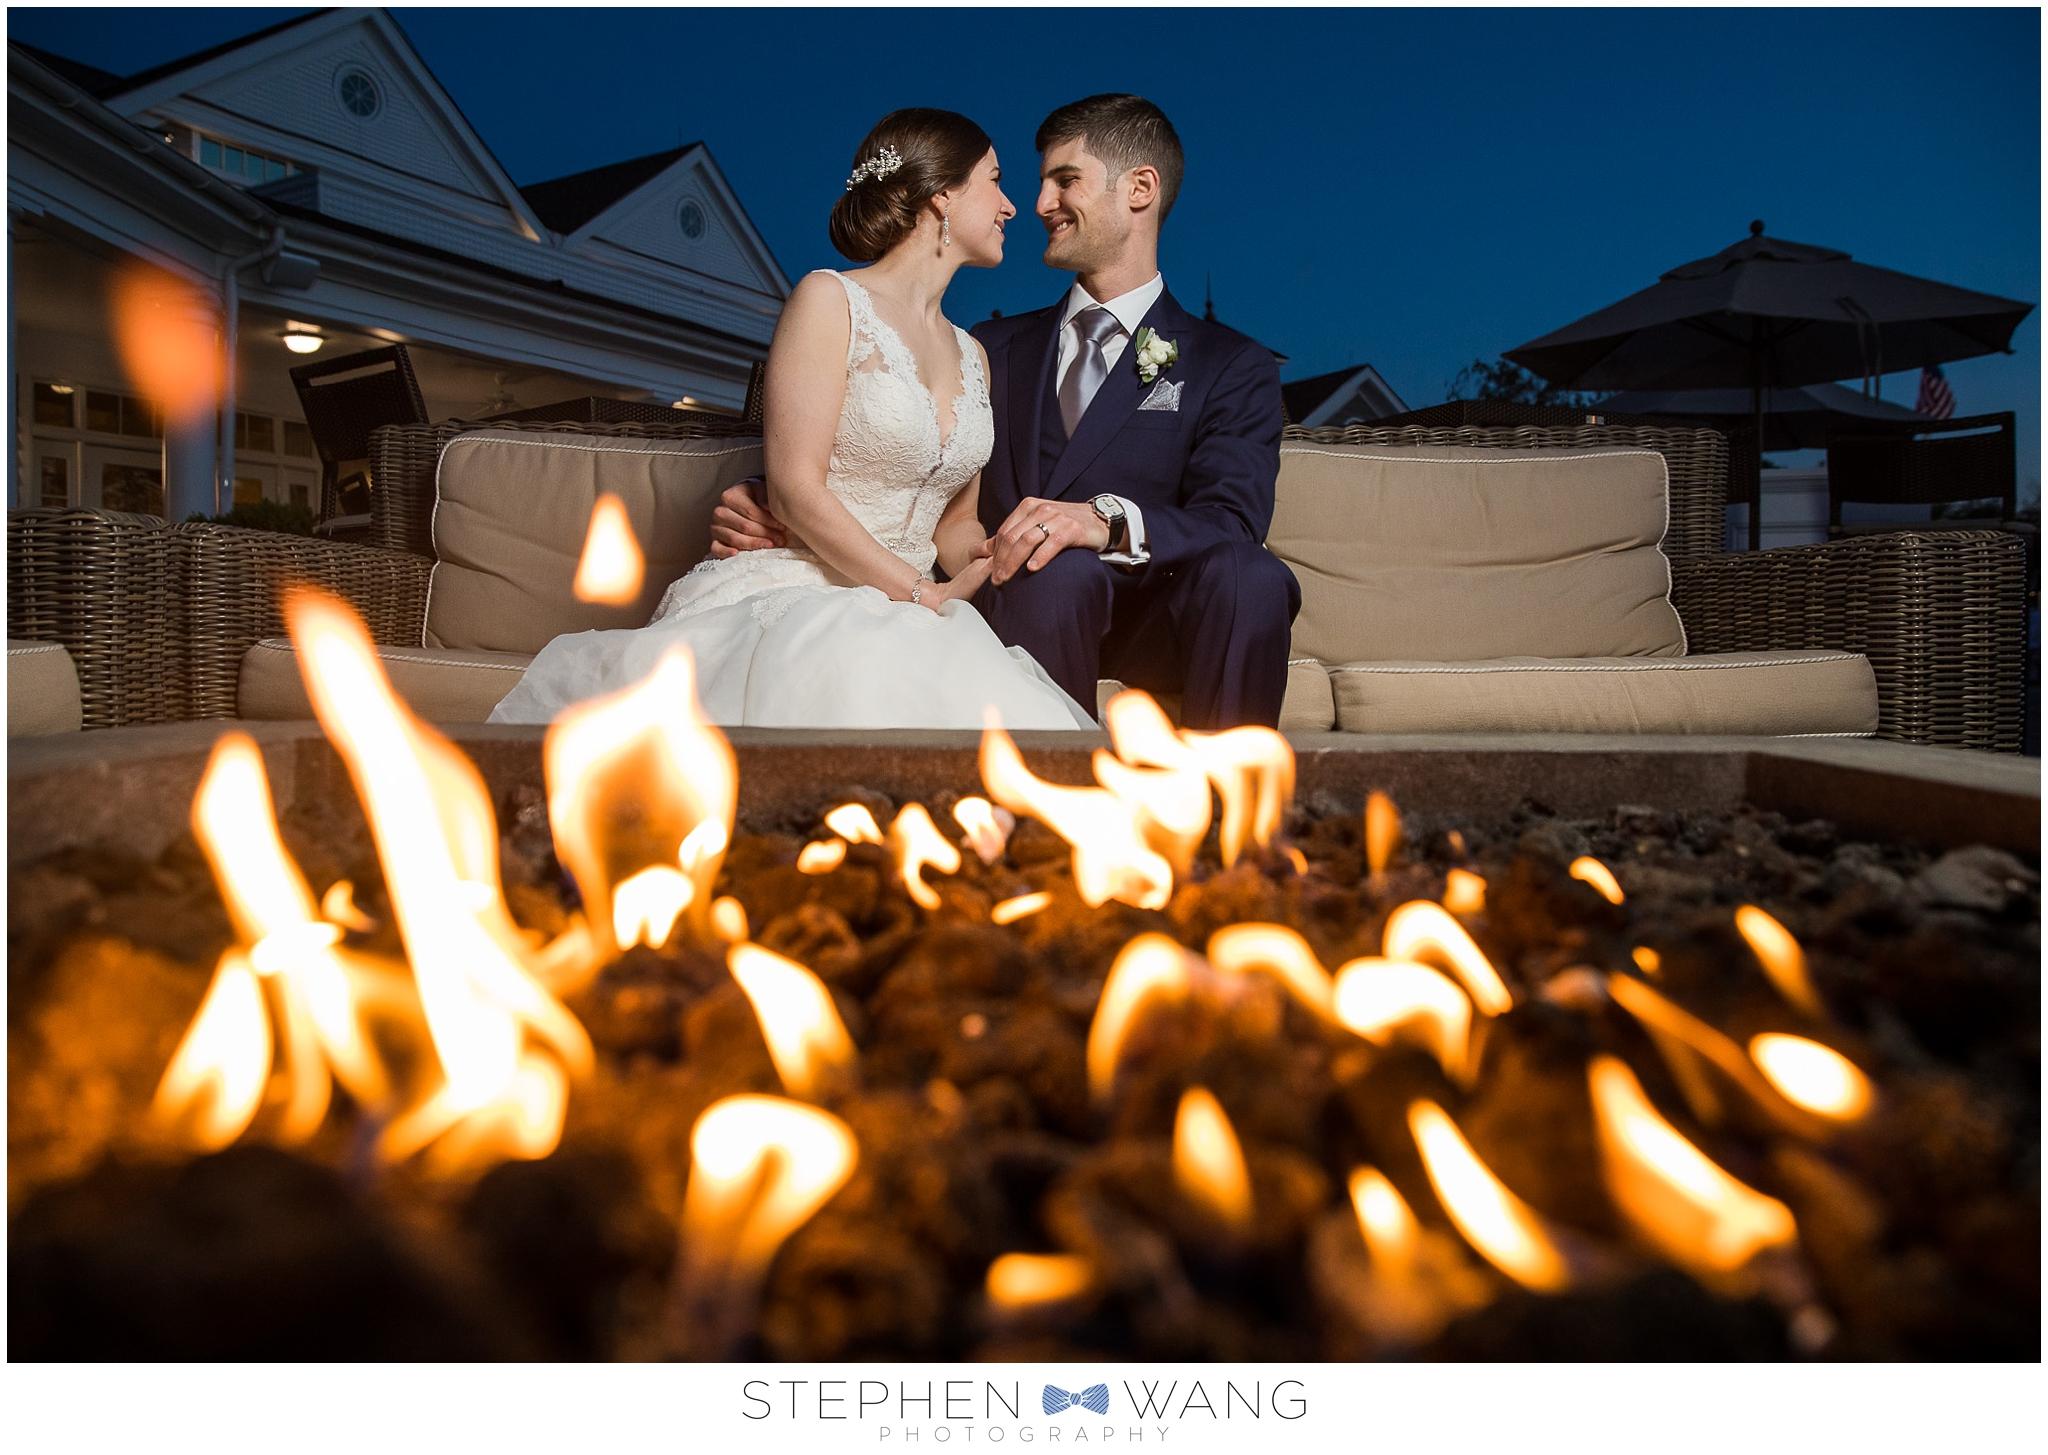 Stephen Wang Photography Shorehaven Norwalk CT Wedding Photographer connecticut shoreline shore haven - 36.jpg